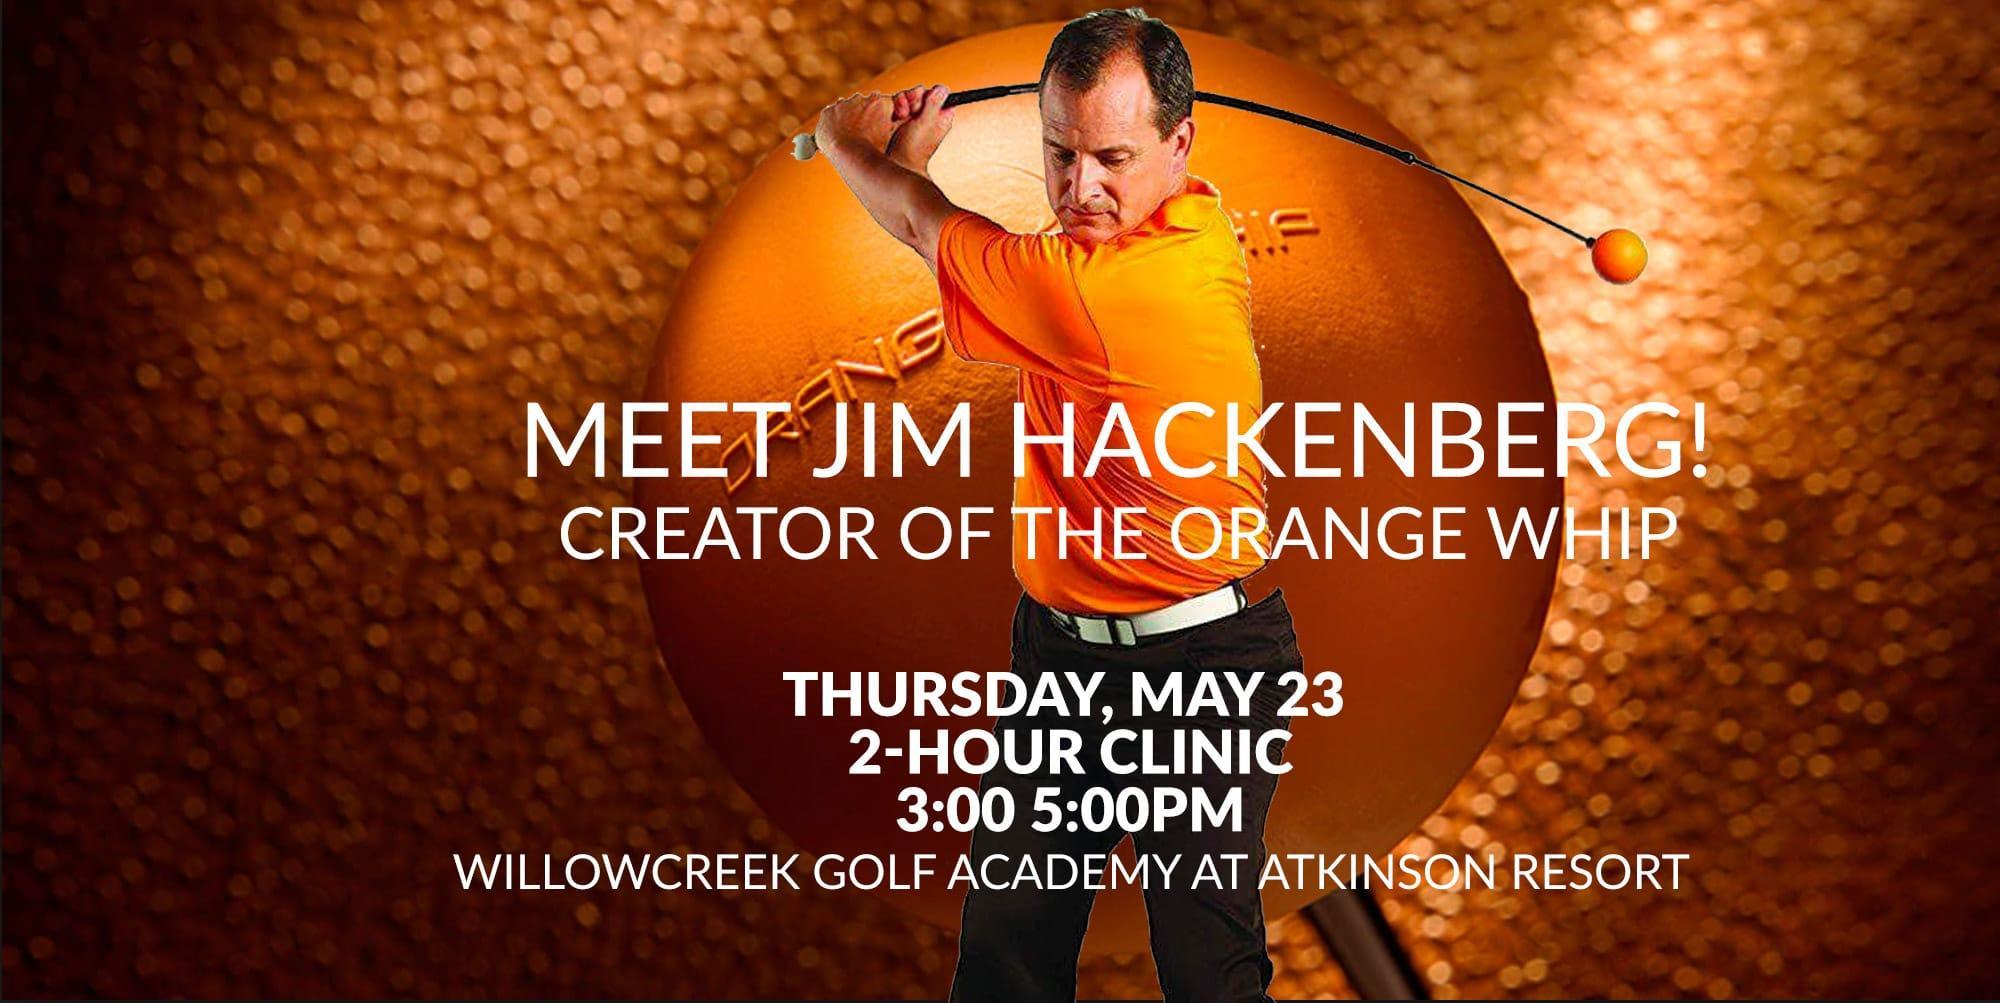 Golf Clinic with Orange Whip Creator Jim Hackenberg